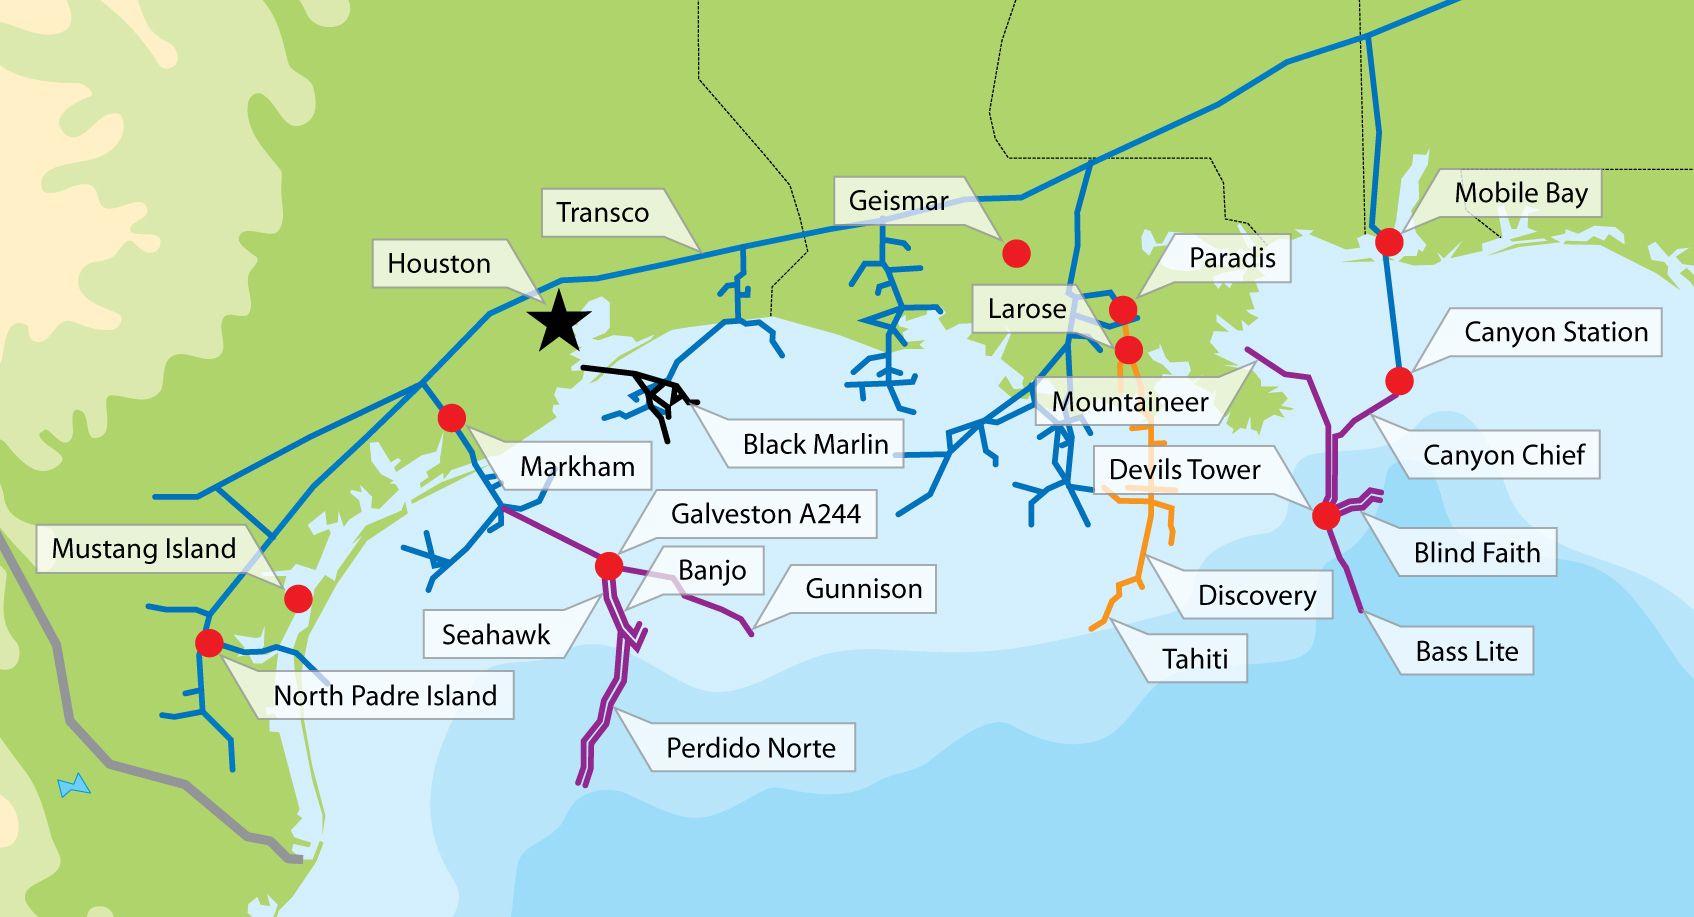 Texas Gulf Oil Rig Map | Gulf Of Mexico Oil Fields Map | $$-Texas - Map Of Texas Coastline